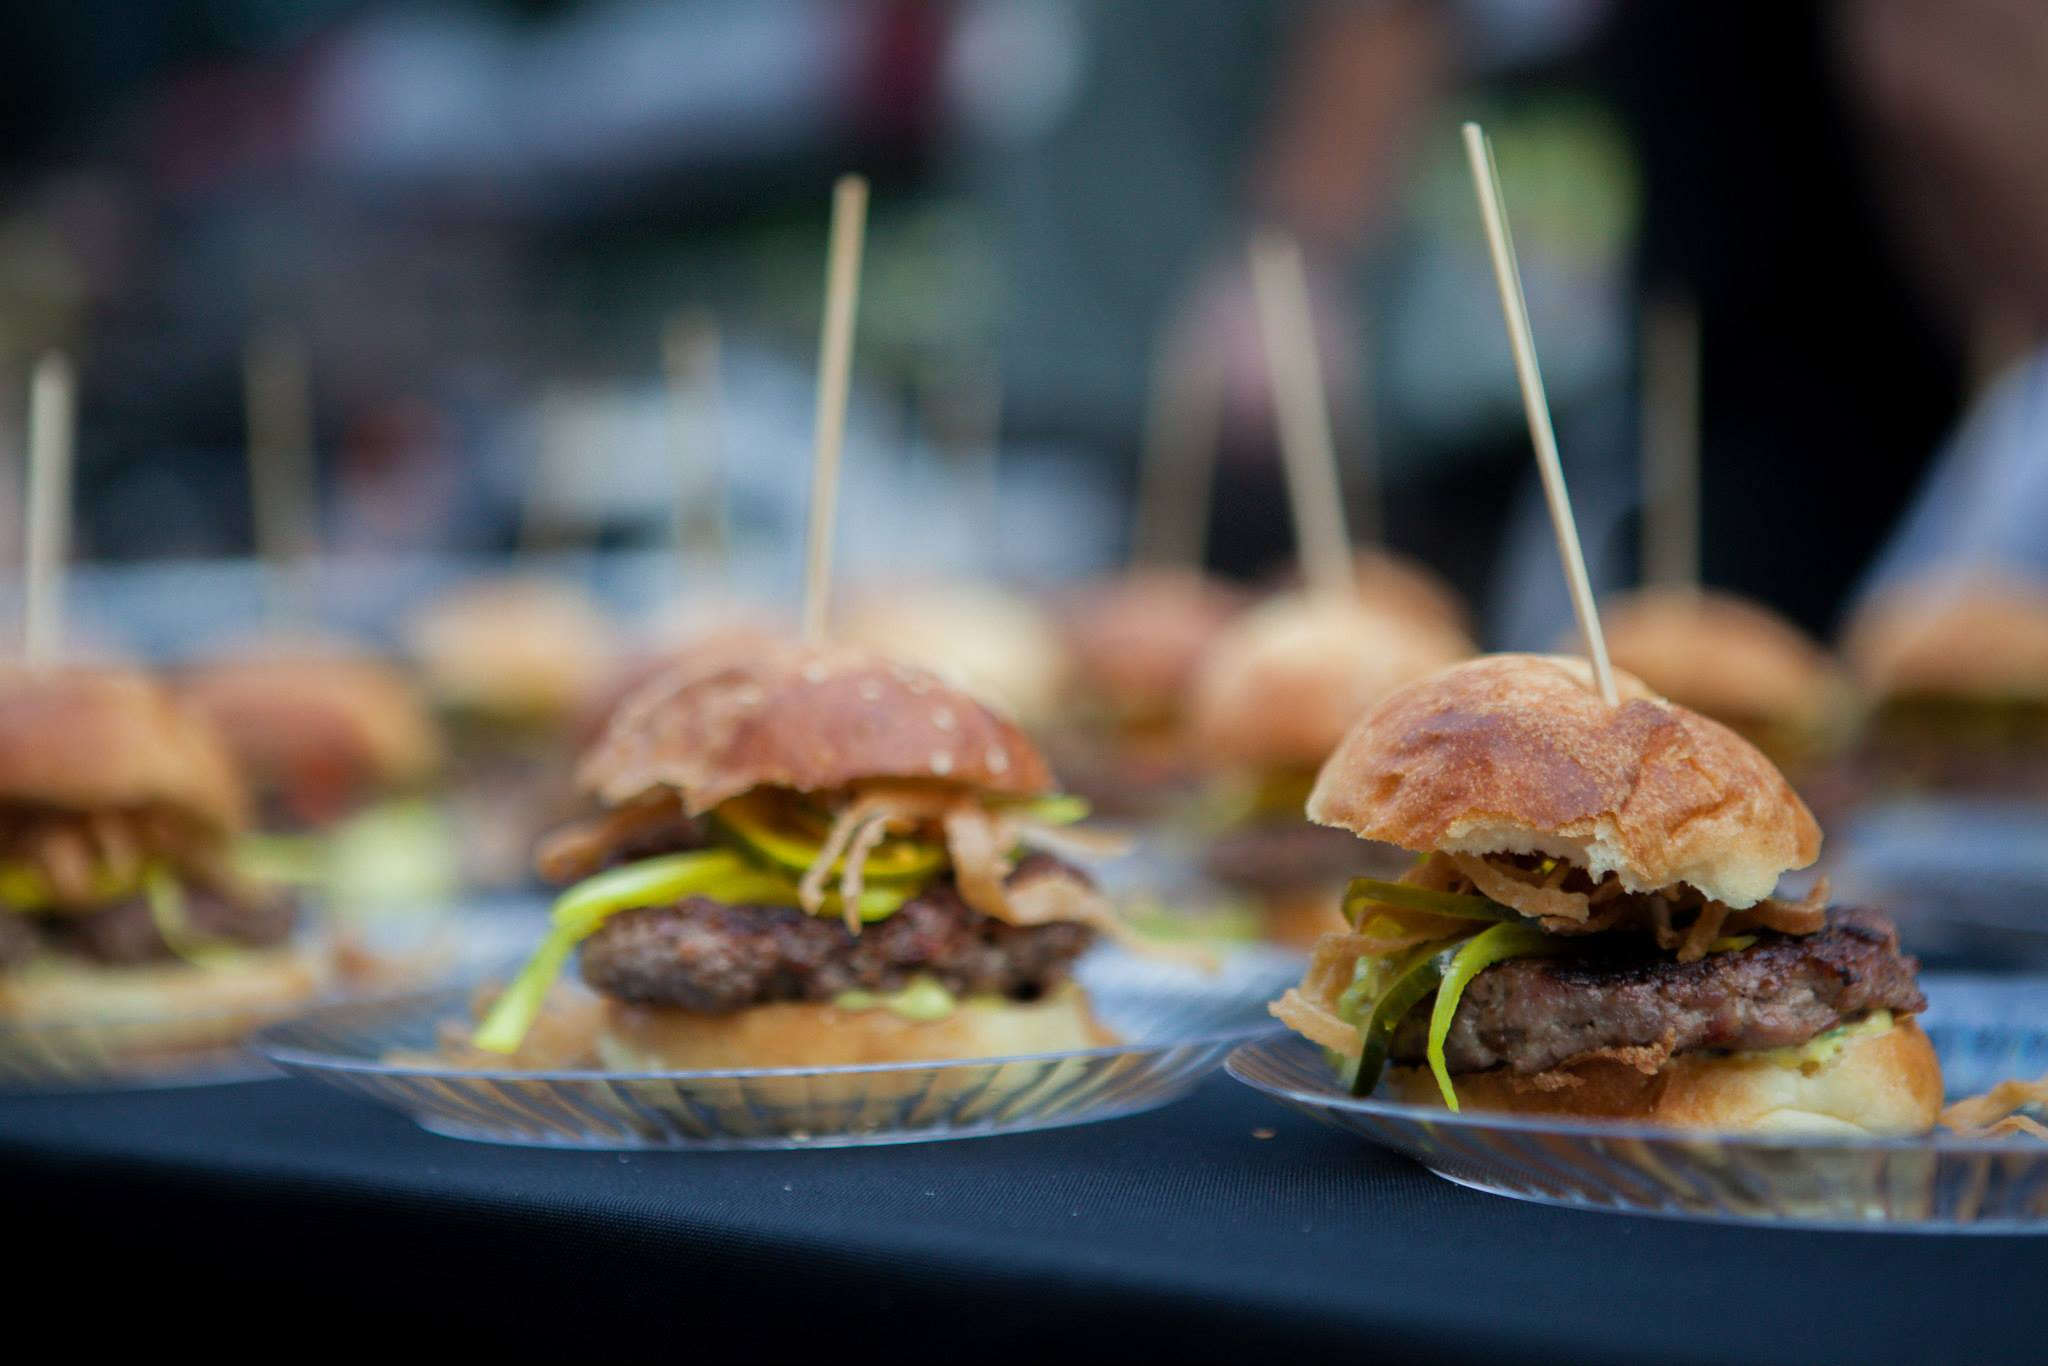 Battle of the Burger 2014, photo by Nettie Wasowski